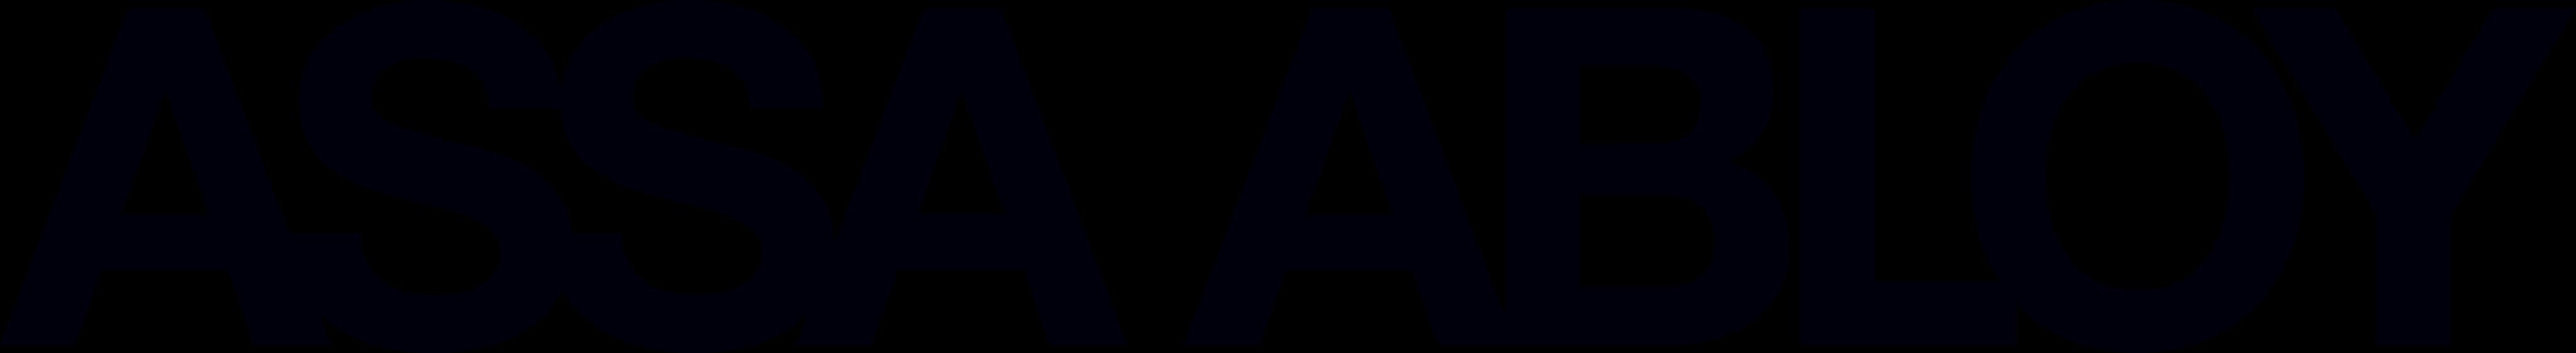 assa abloy logo - ASSA ABLOY Logo